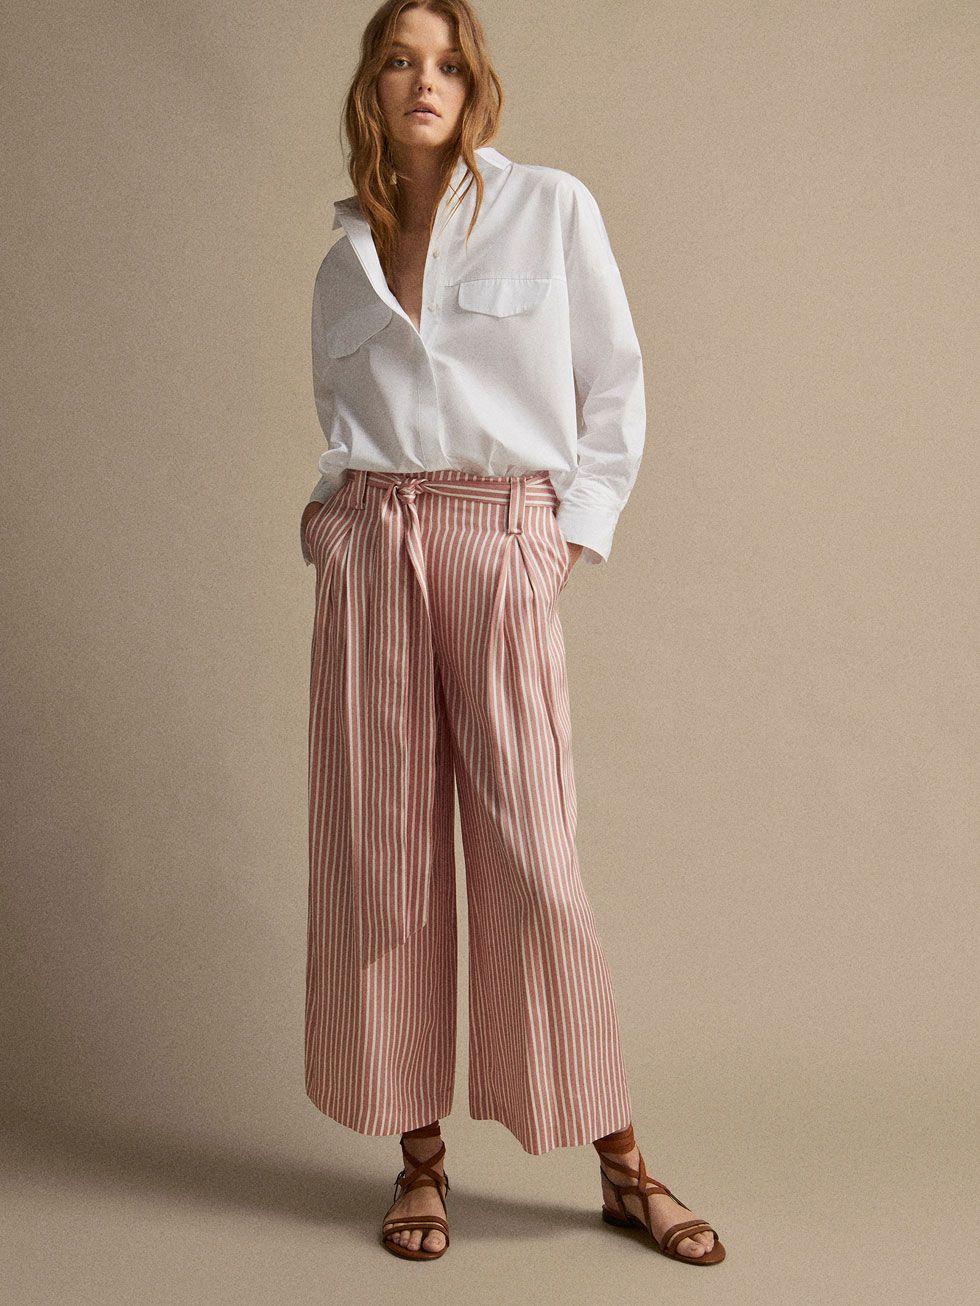 Pantalon Rayas Lazada Culotte Fit Mujer Massimo Dutti Mexico Jupe Culotte Idees De Mode Jupe